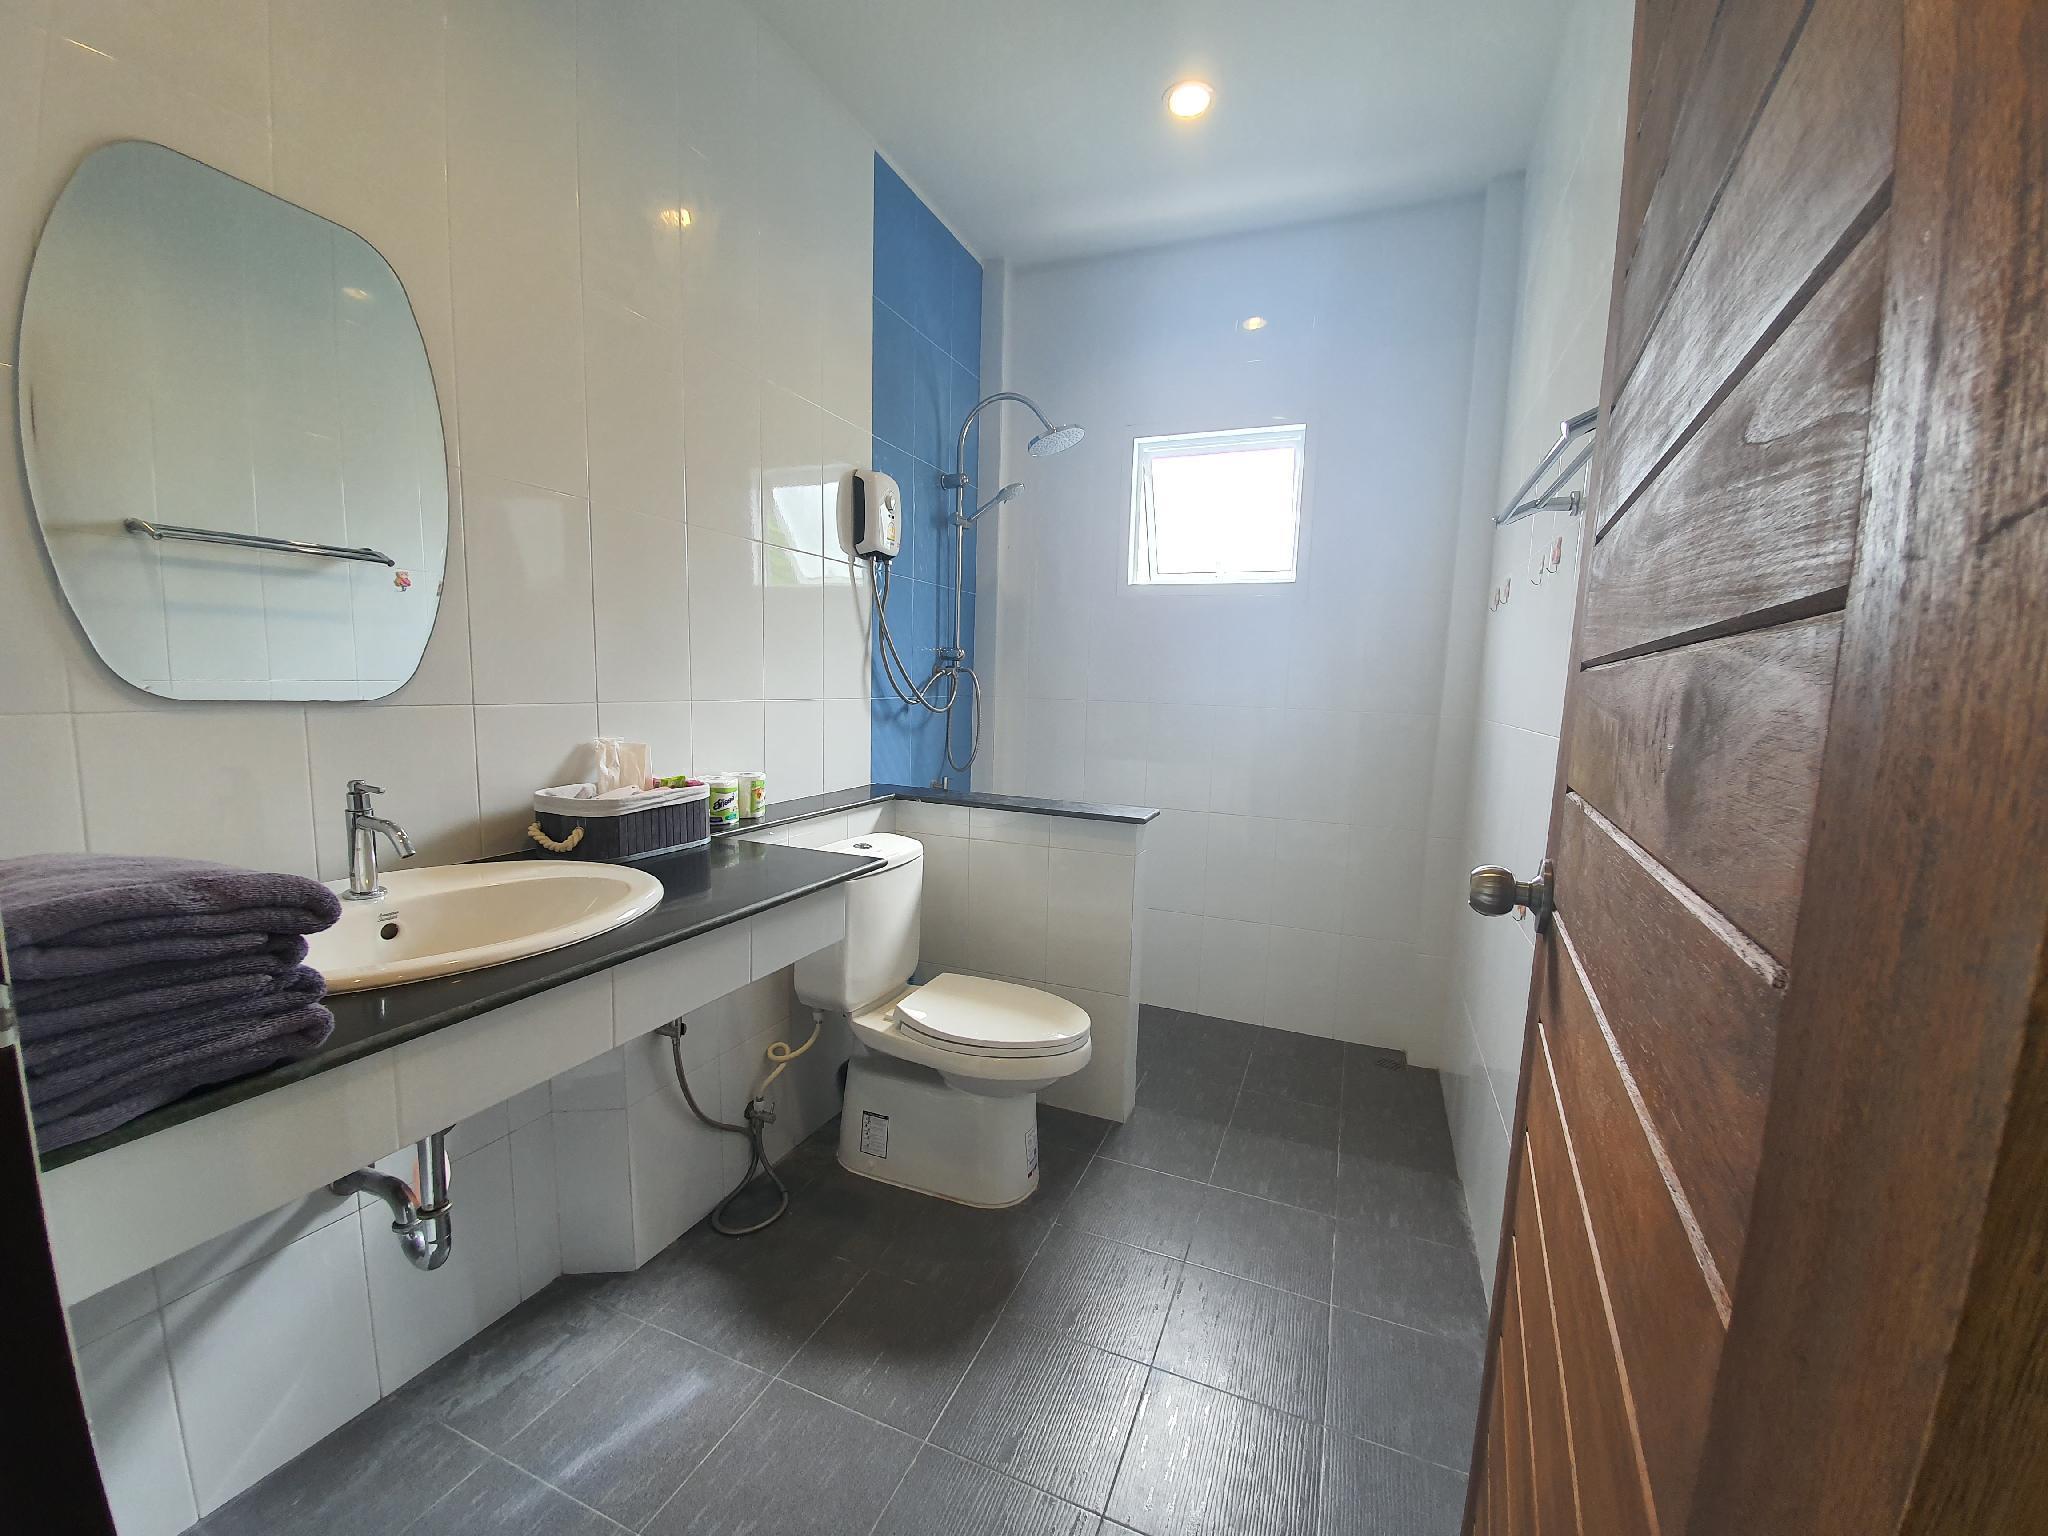 Private House 2 Bedroom Ao Nang  A